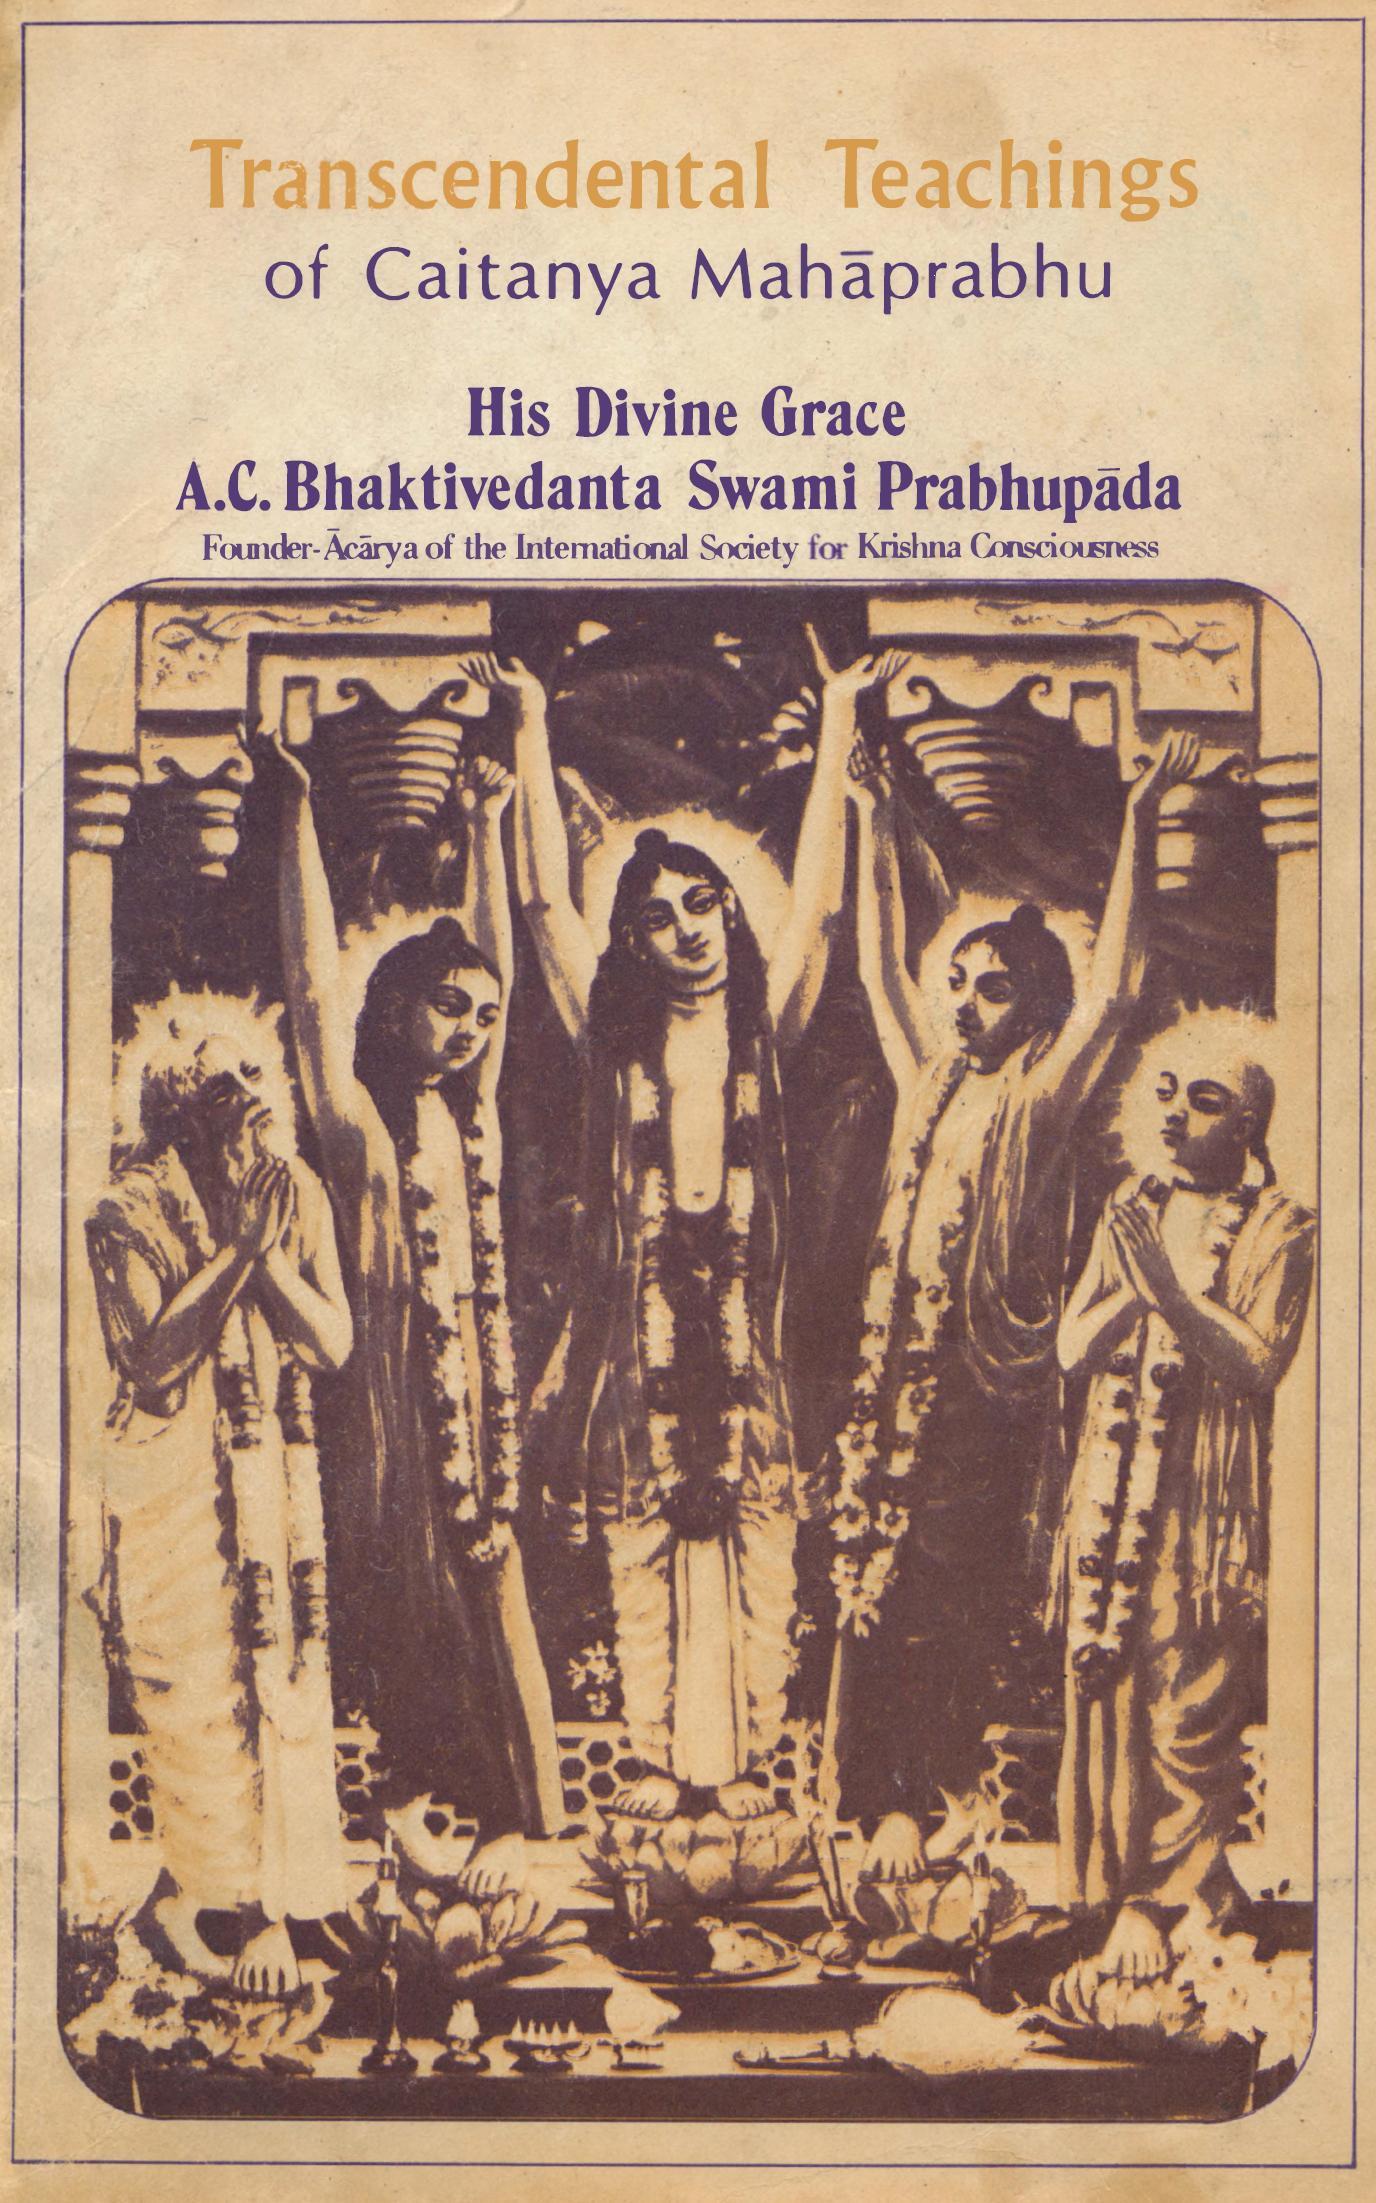 Transcendental teachings of Lord Caitanya